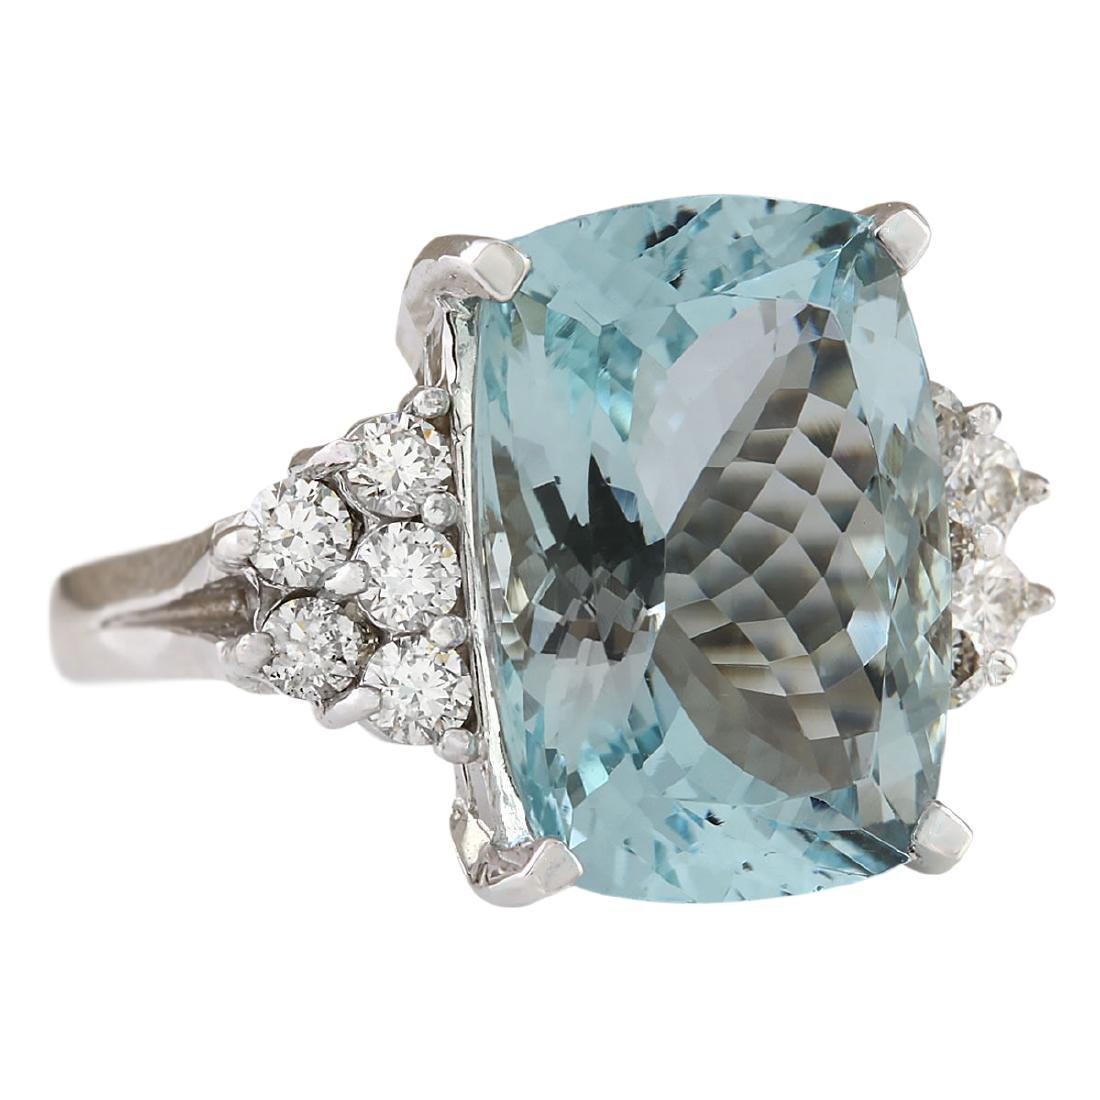 8.13 CTW Natural Aquamarine And Diamond Ring In 18K - 2